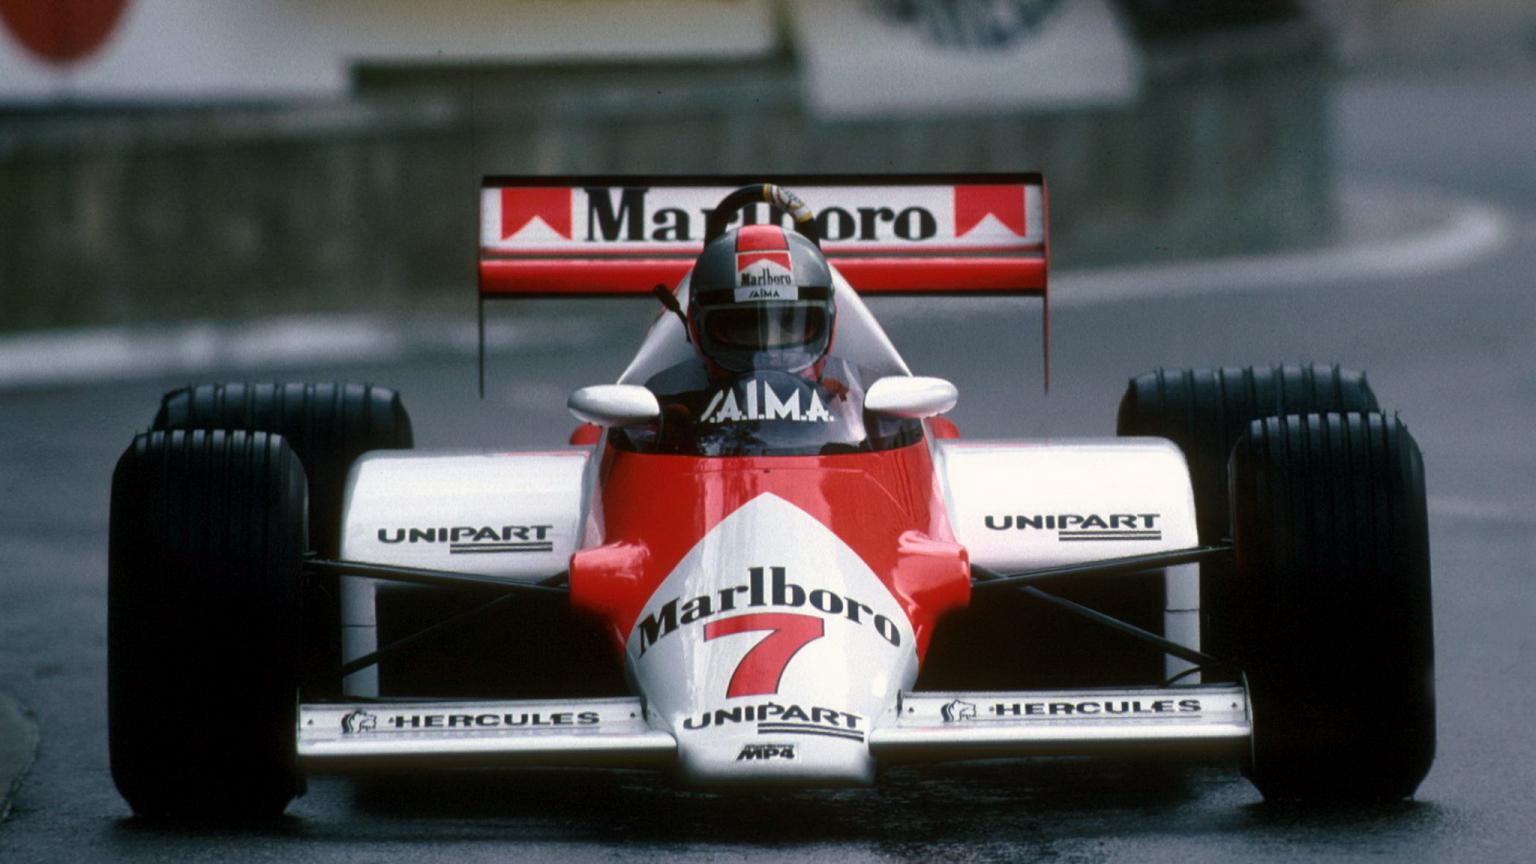 Free download 1983 McLaren MP4 1C Formula f 1 race racing ...